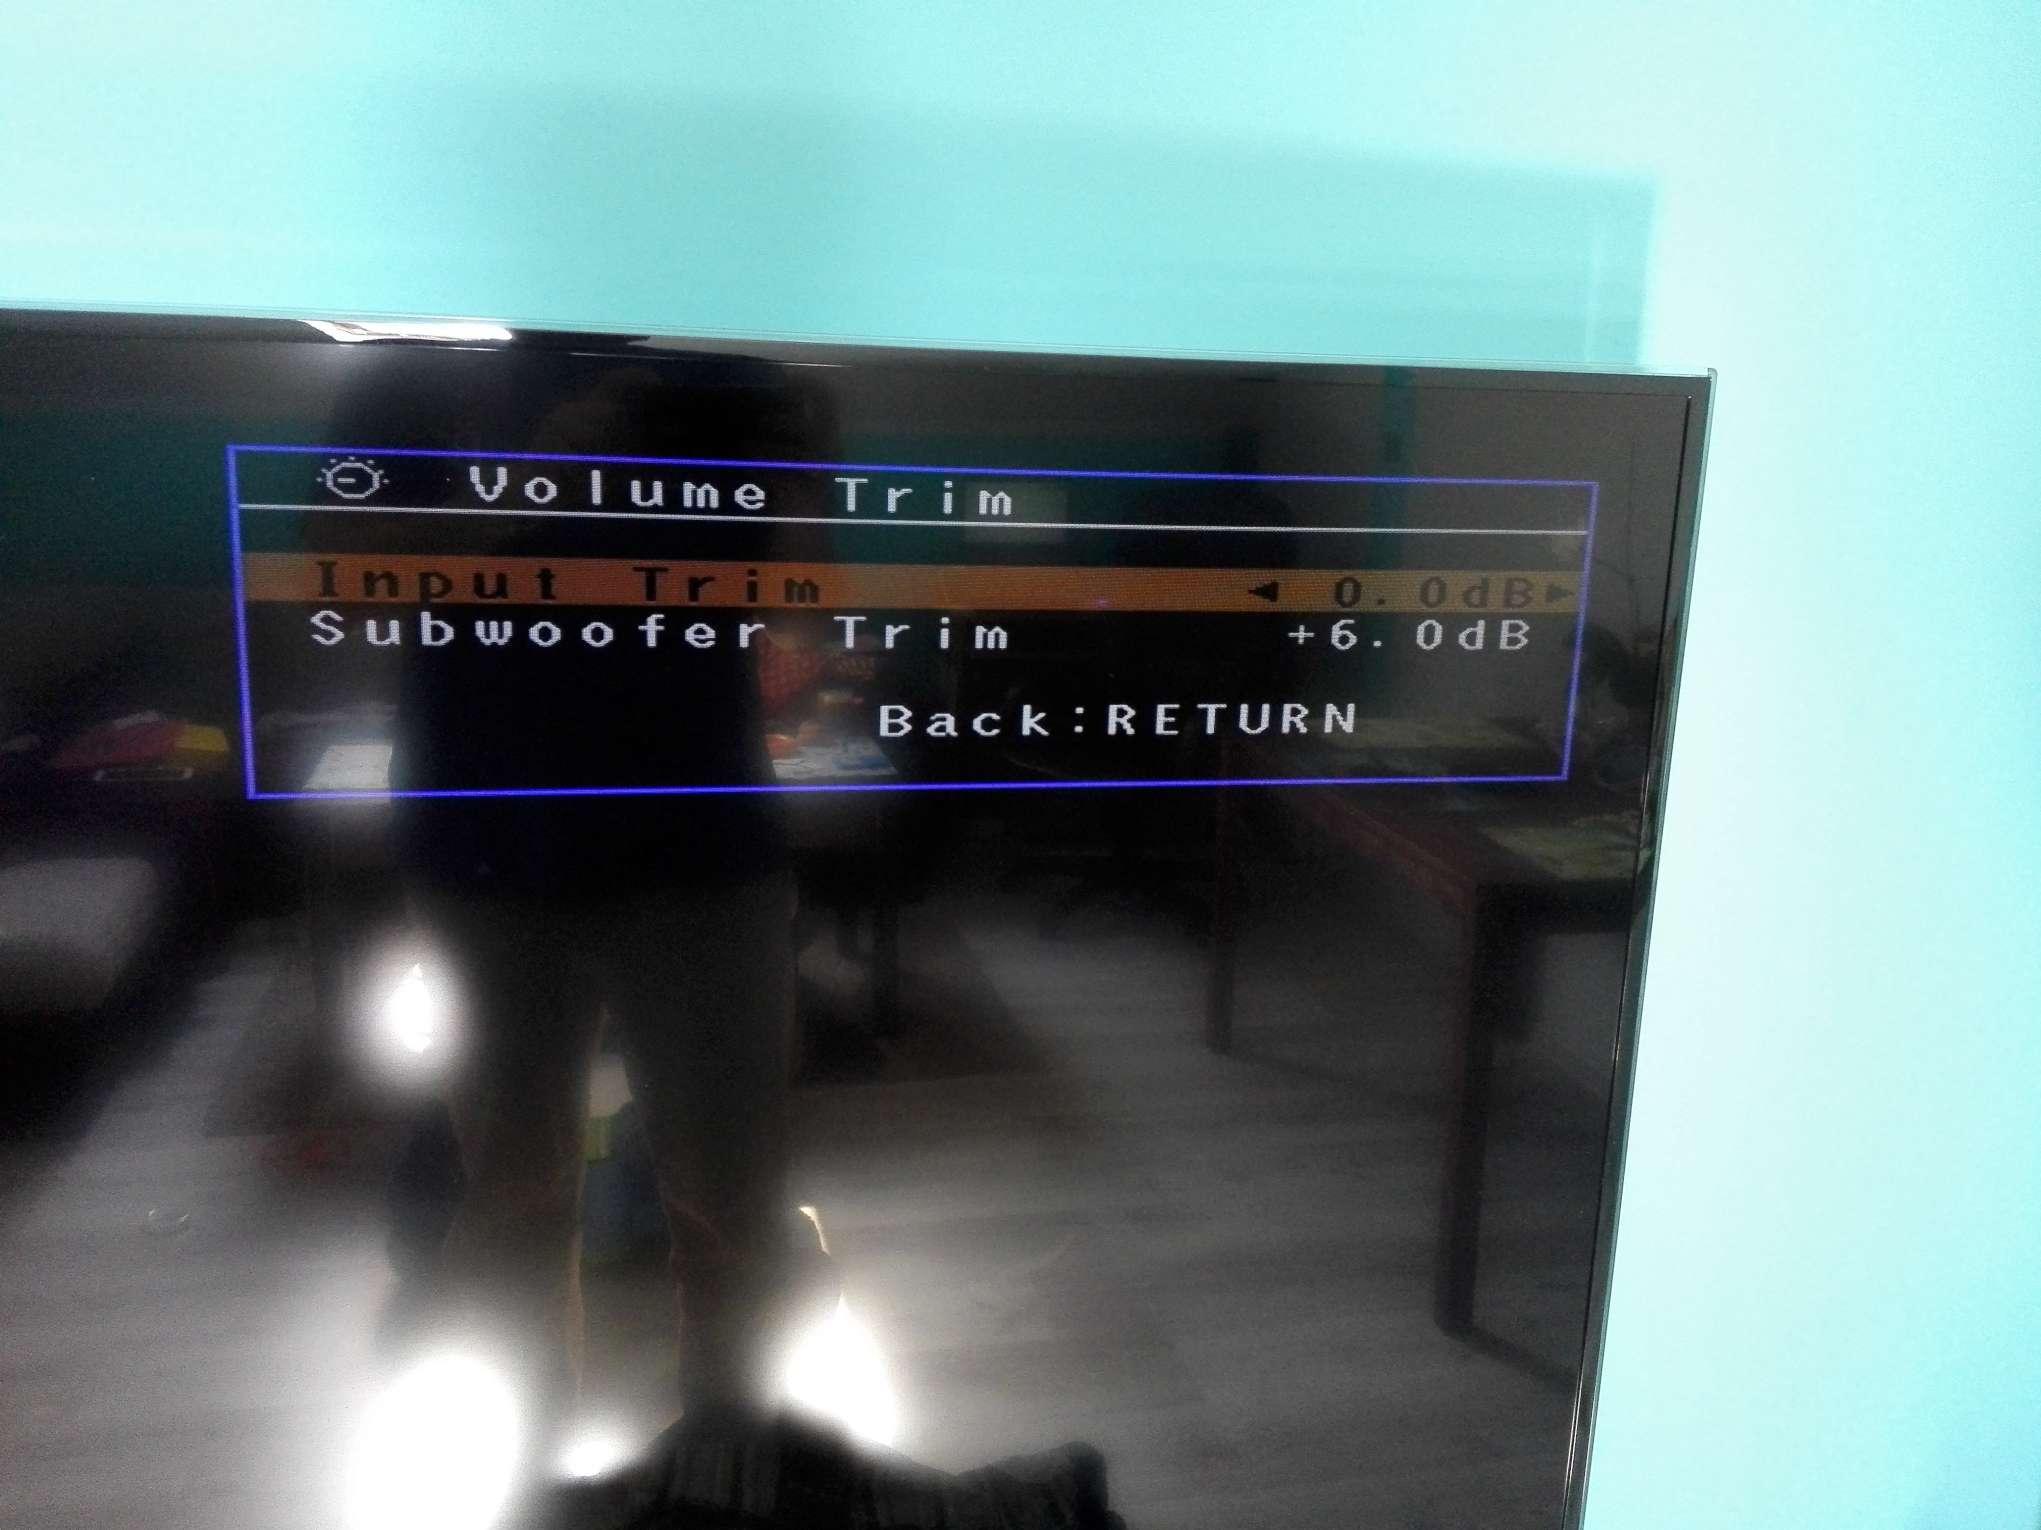 TV Samsung, Dekoder NC+,Yamaha - Jak prawidłowo połączyć ze sobą TV/AMPLI/NC+